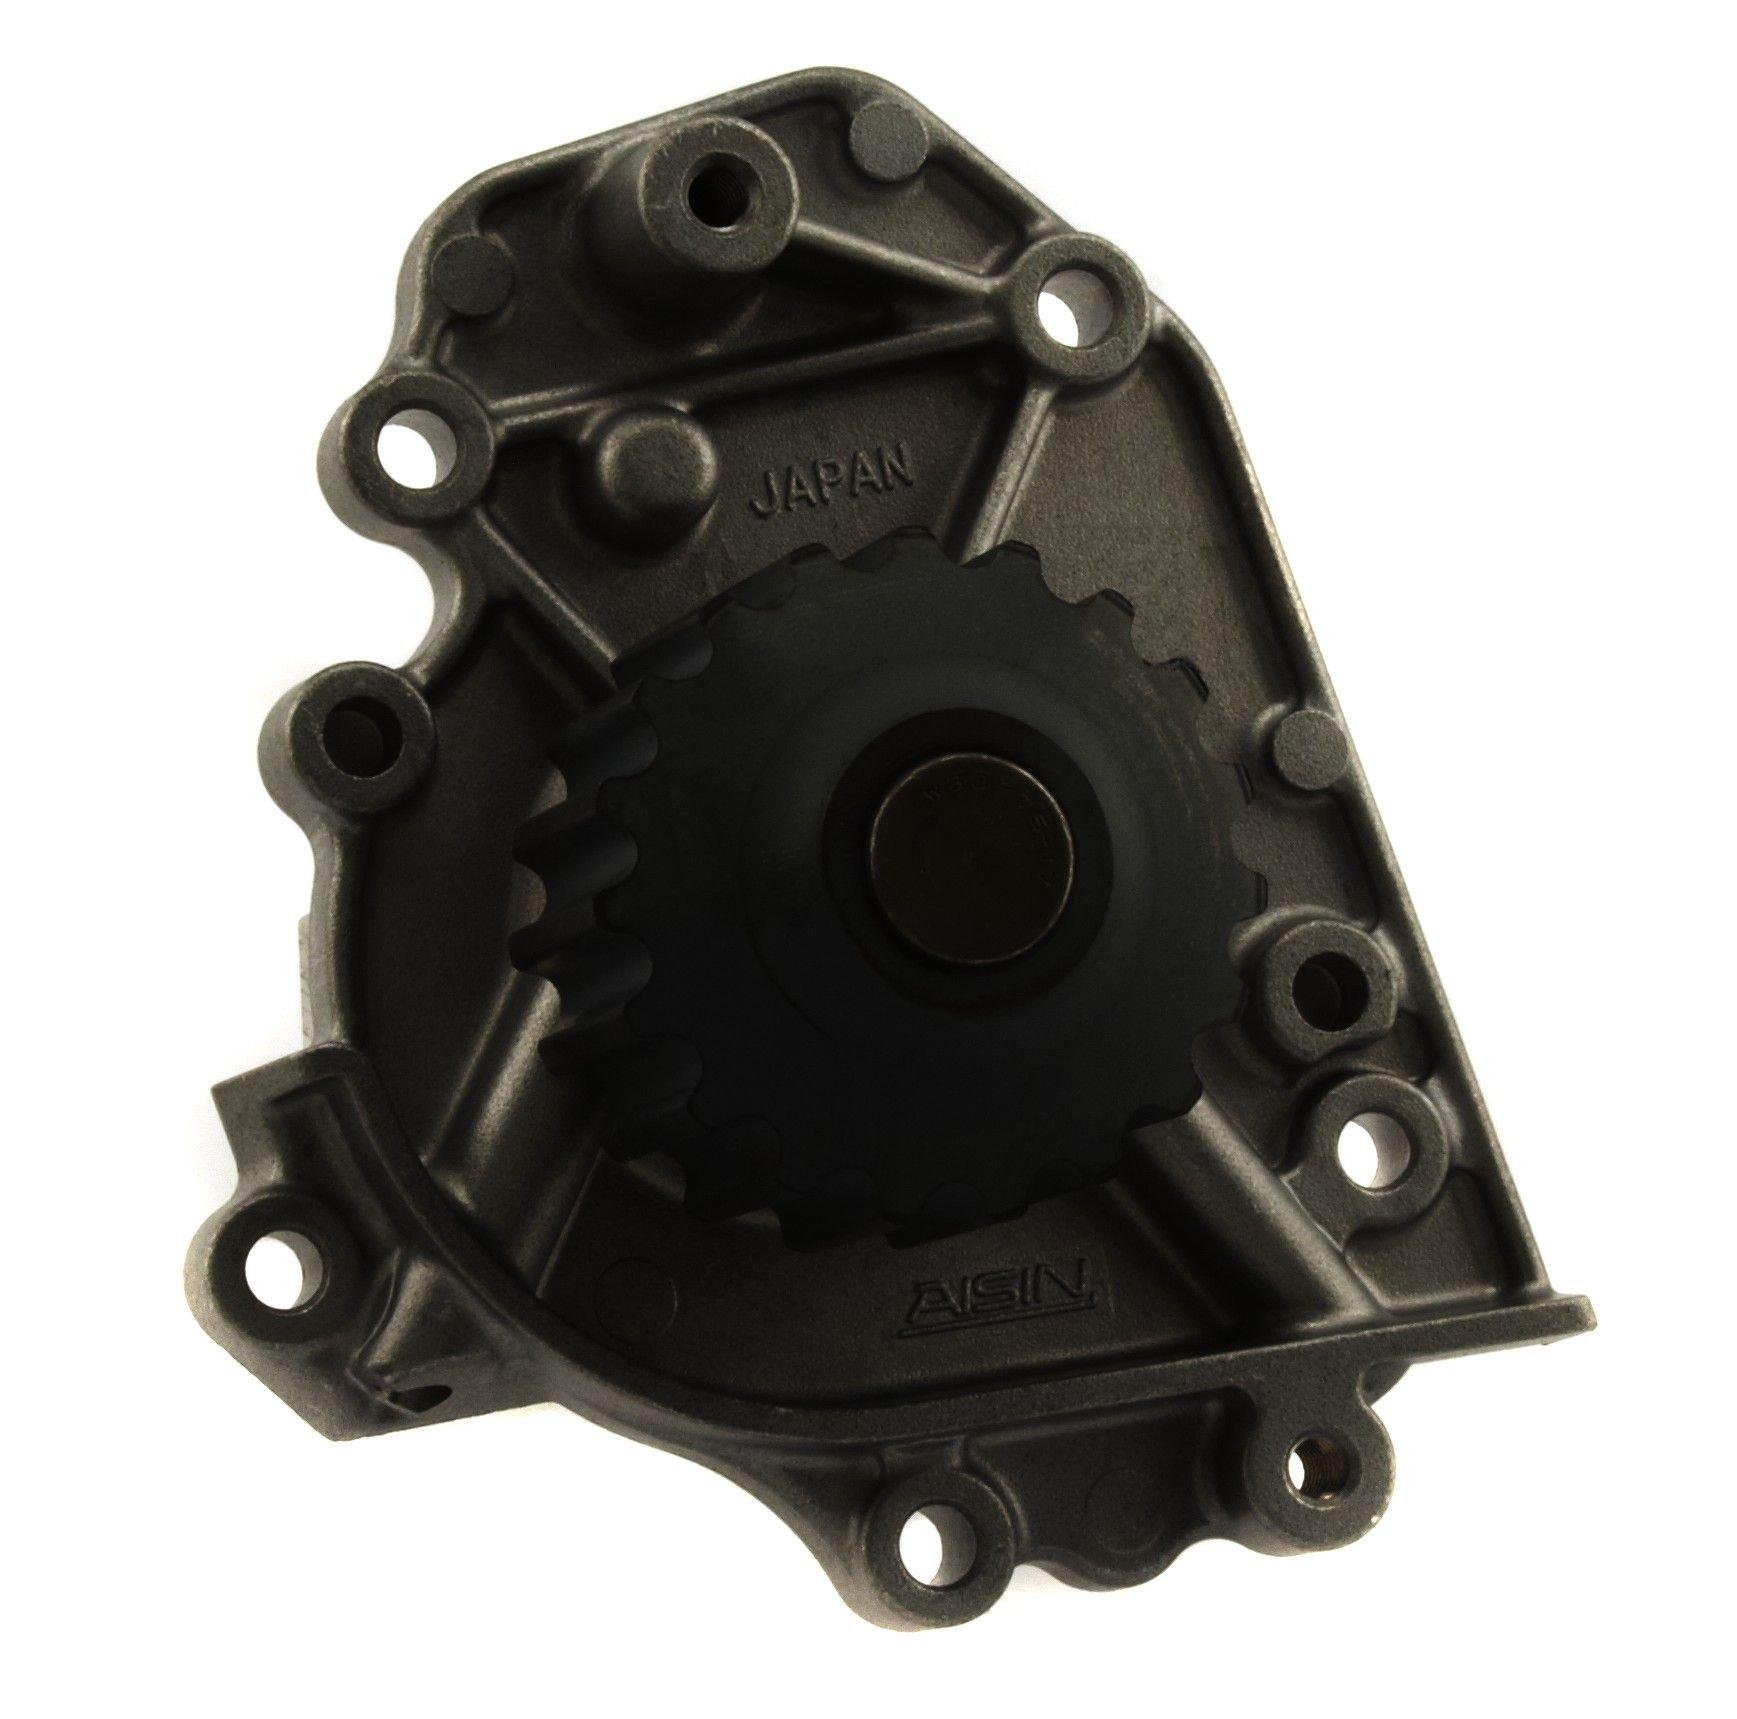 Acura Integra Engine Water Pump Replacement AISIN Airtex Aisin - 1996 acura integra parts